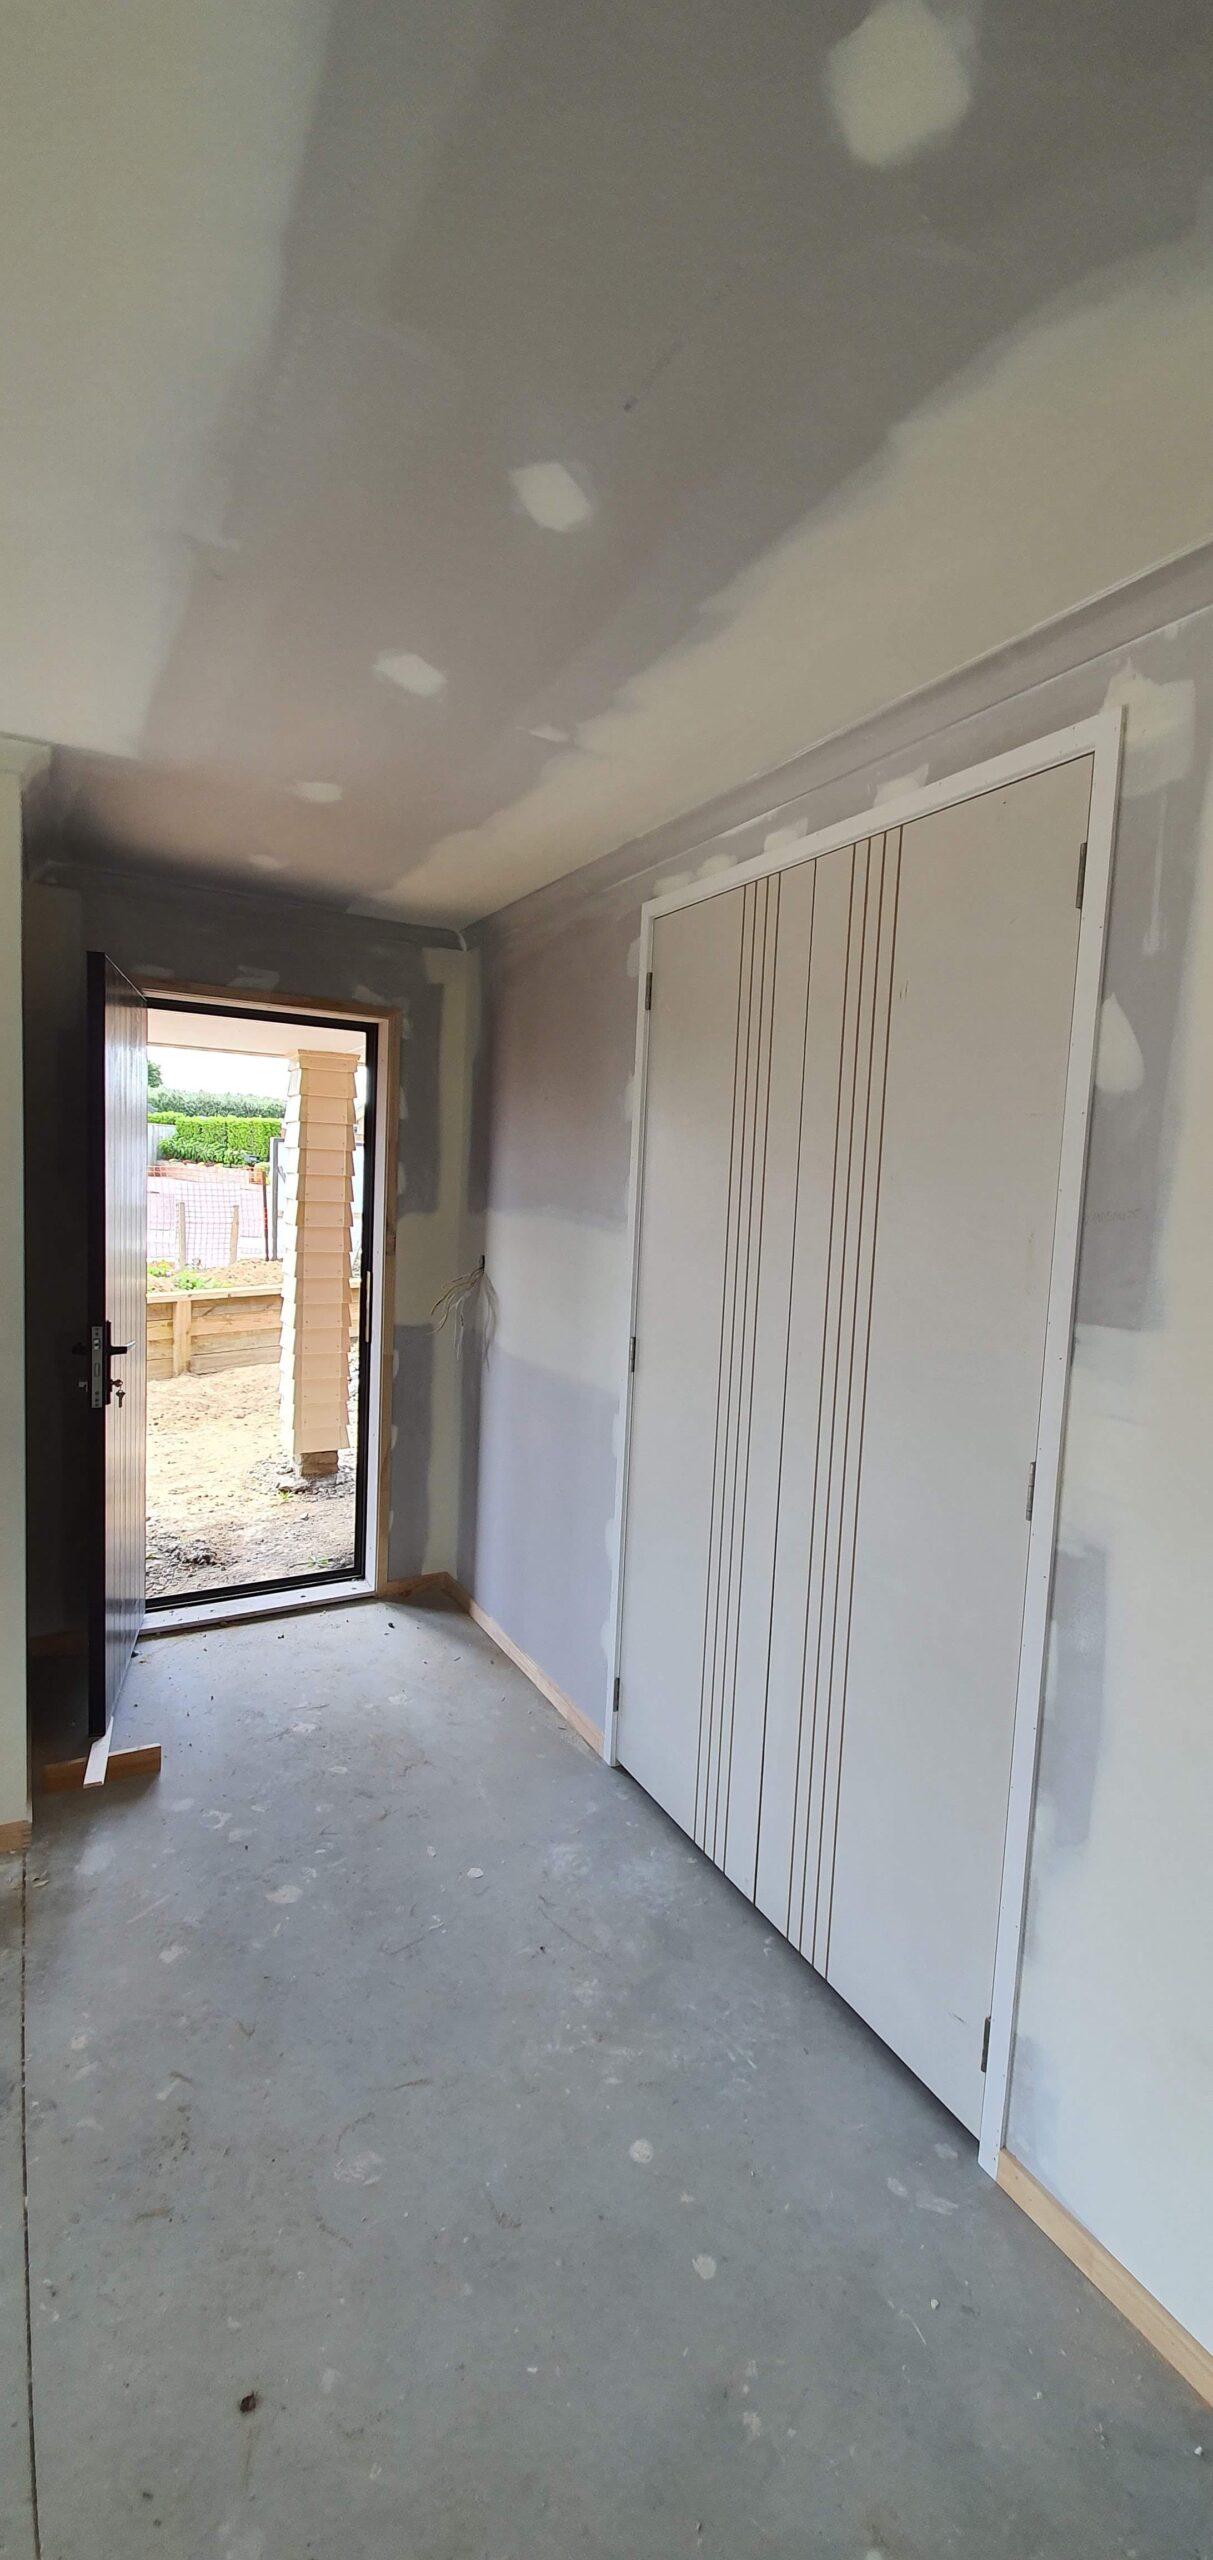 08. Skirting, architraves, doors